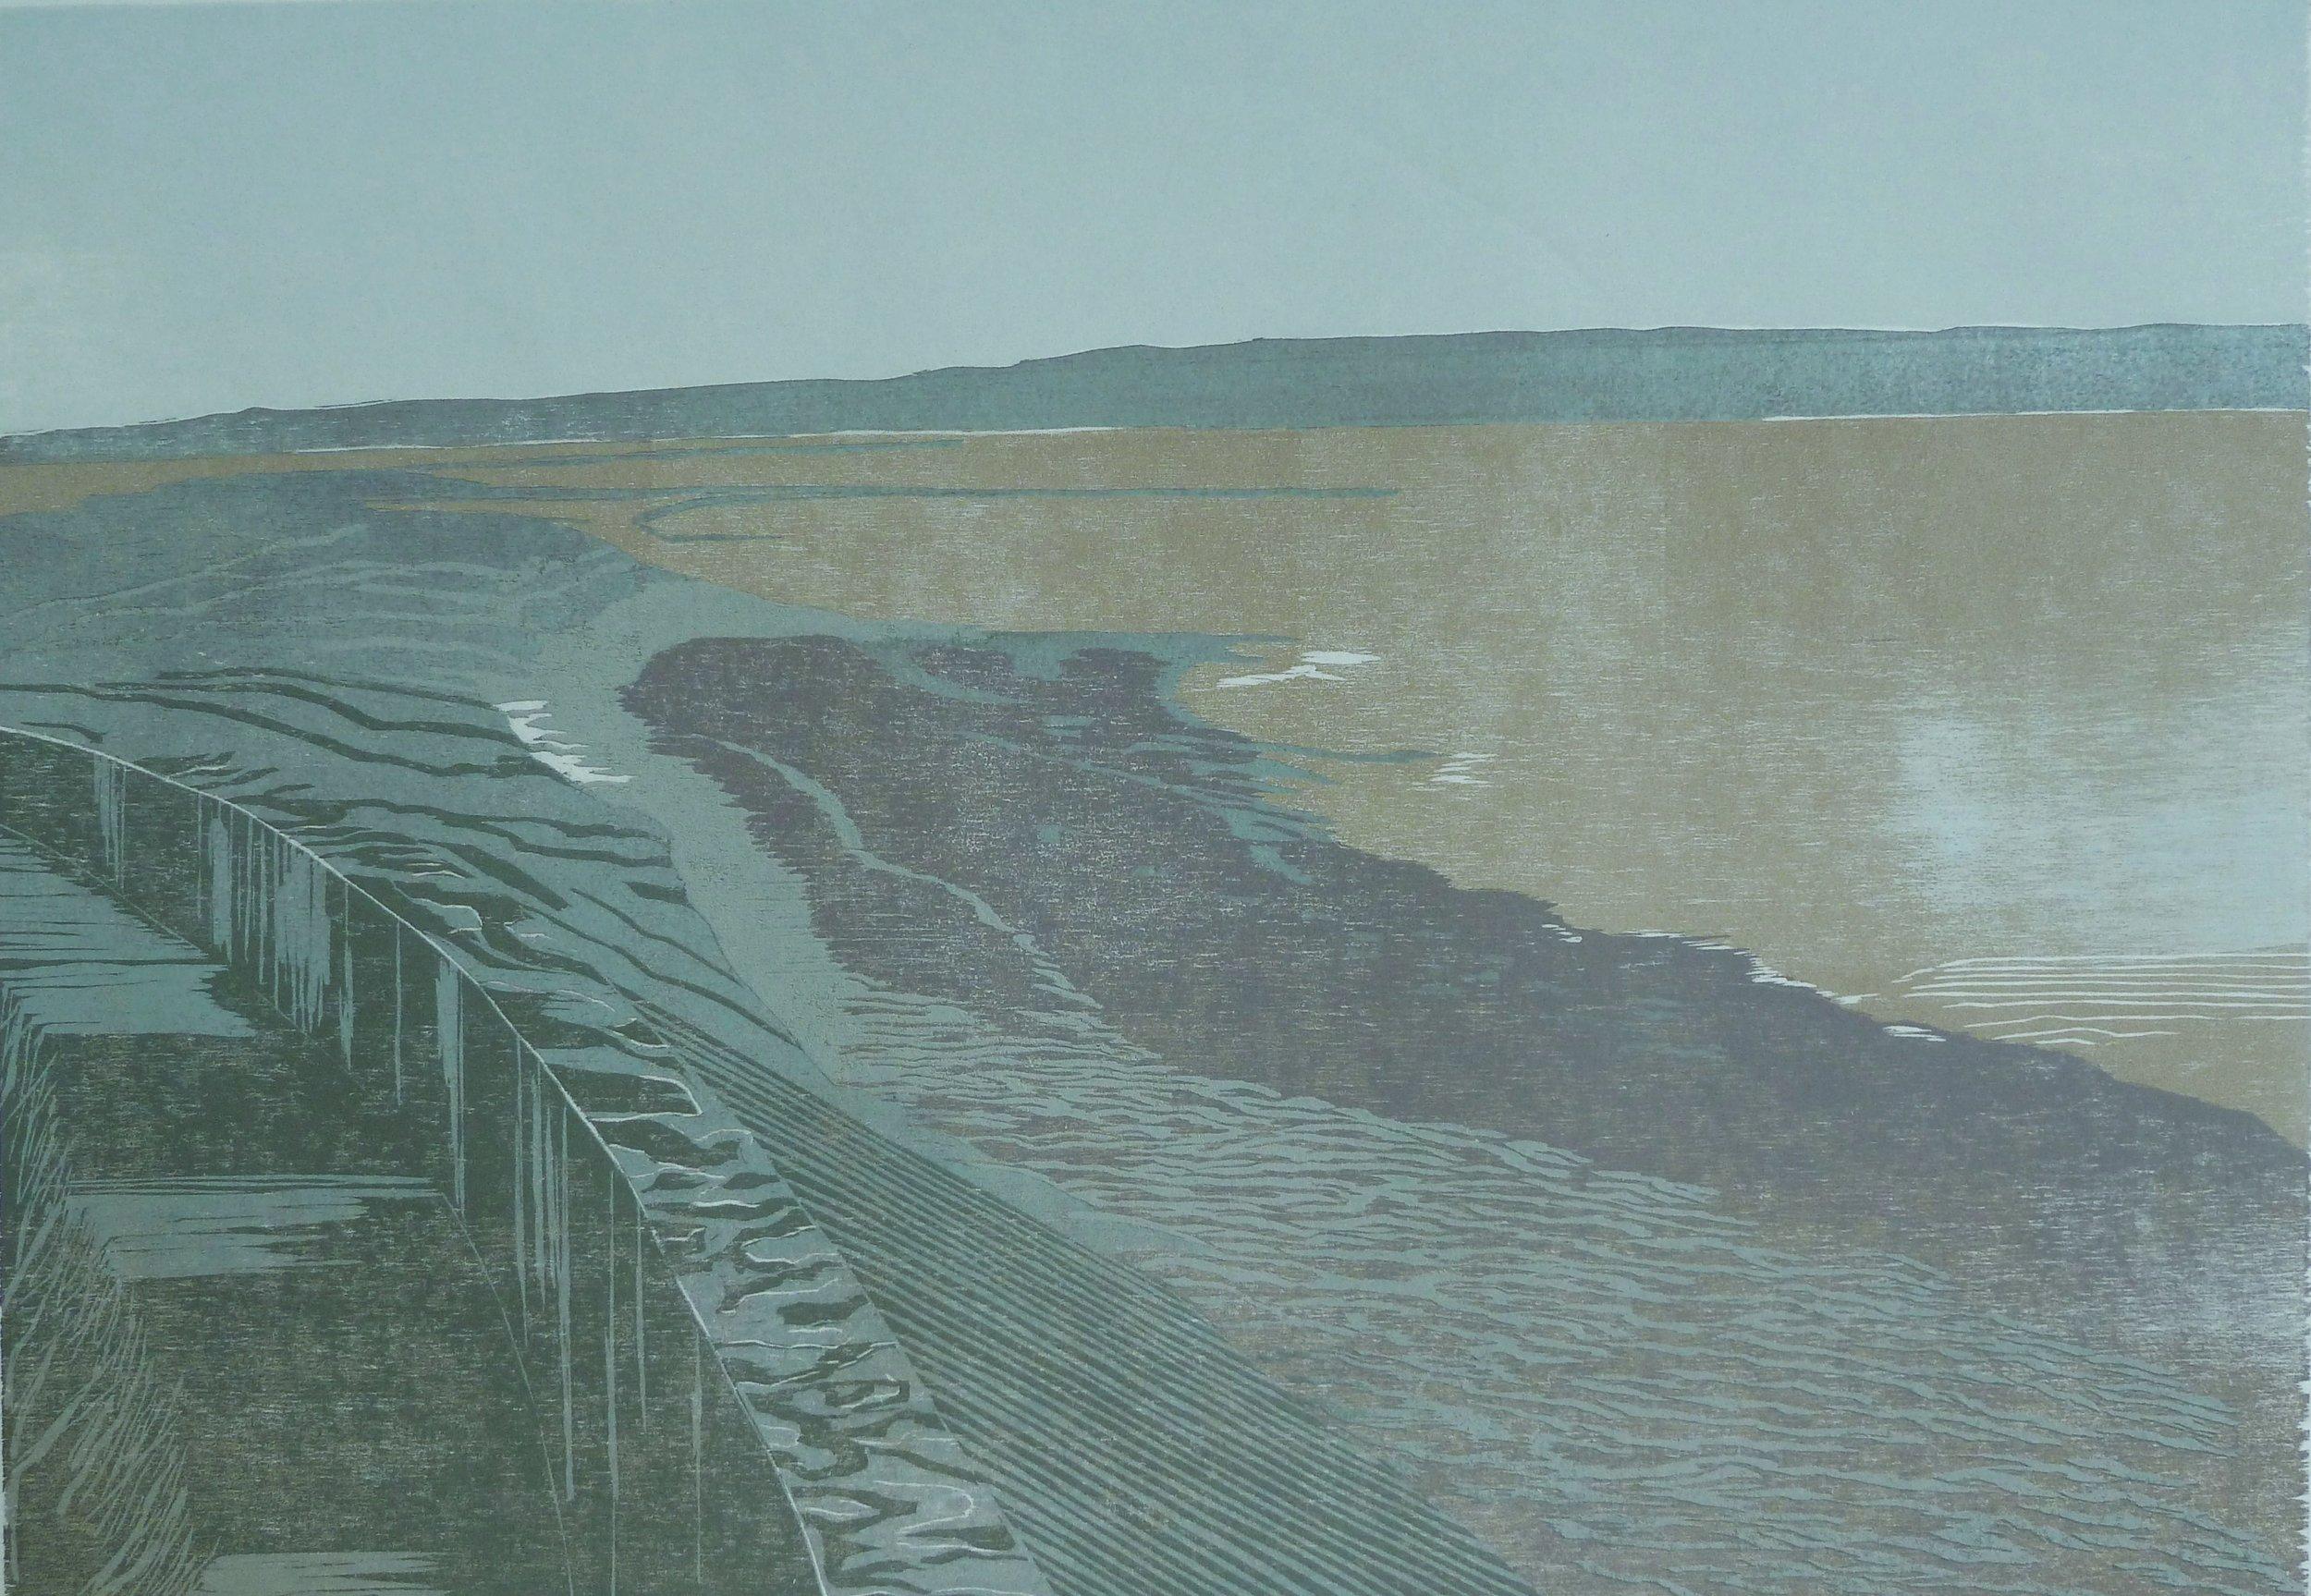 Estuary Wall by Martine Baldwin